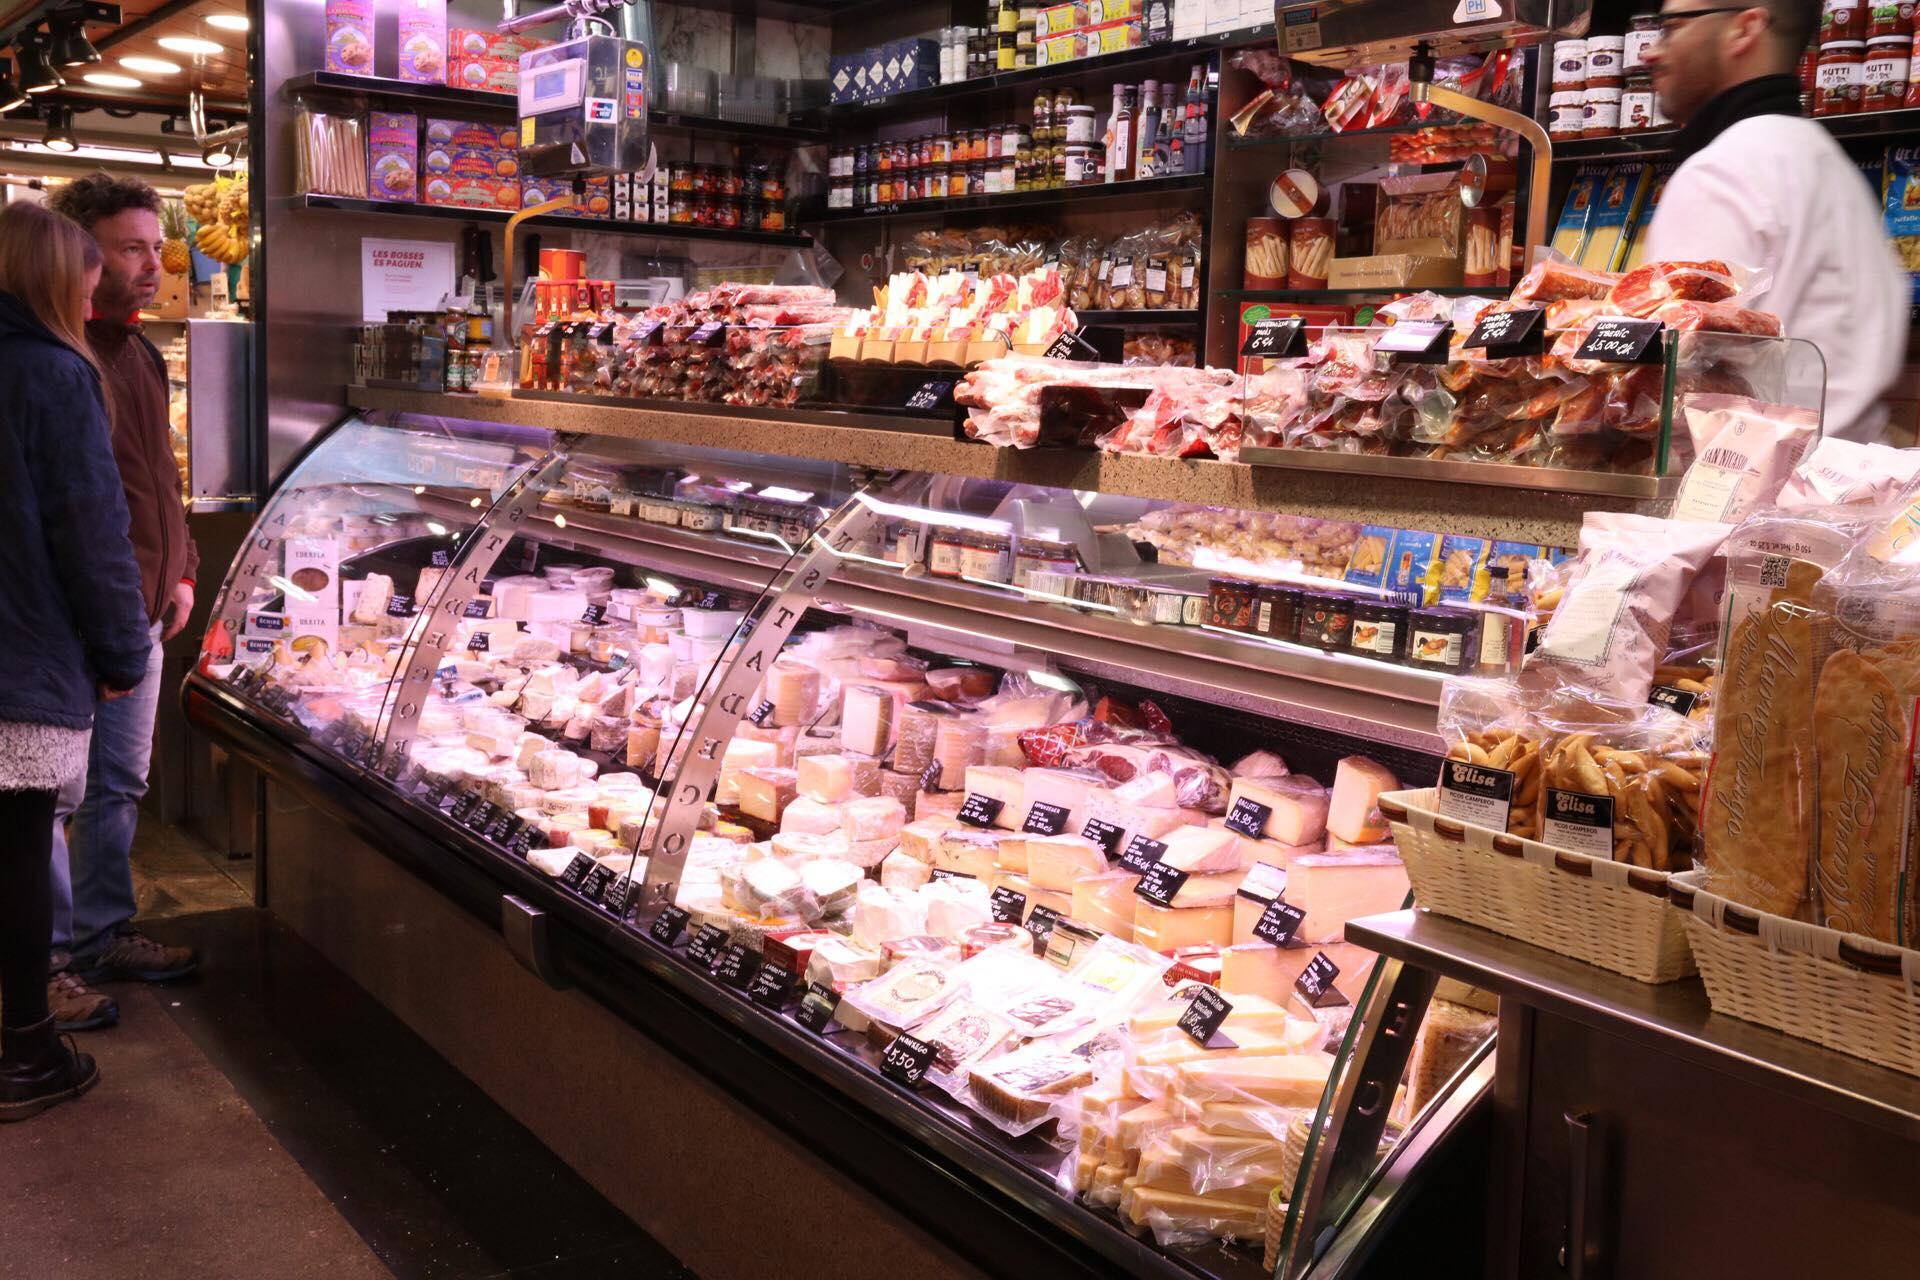 boqueria cheese display 2019.jpg